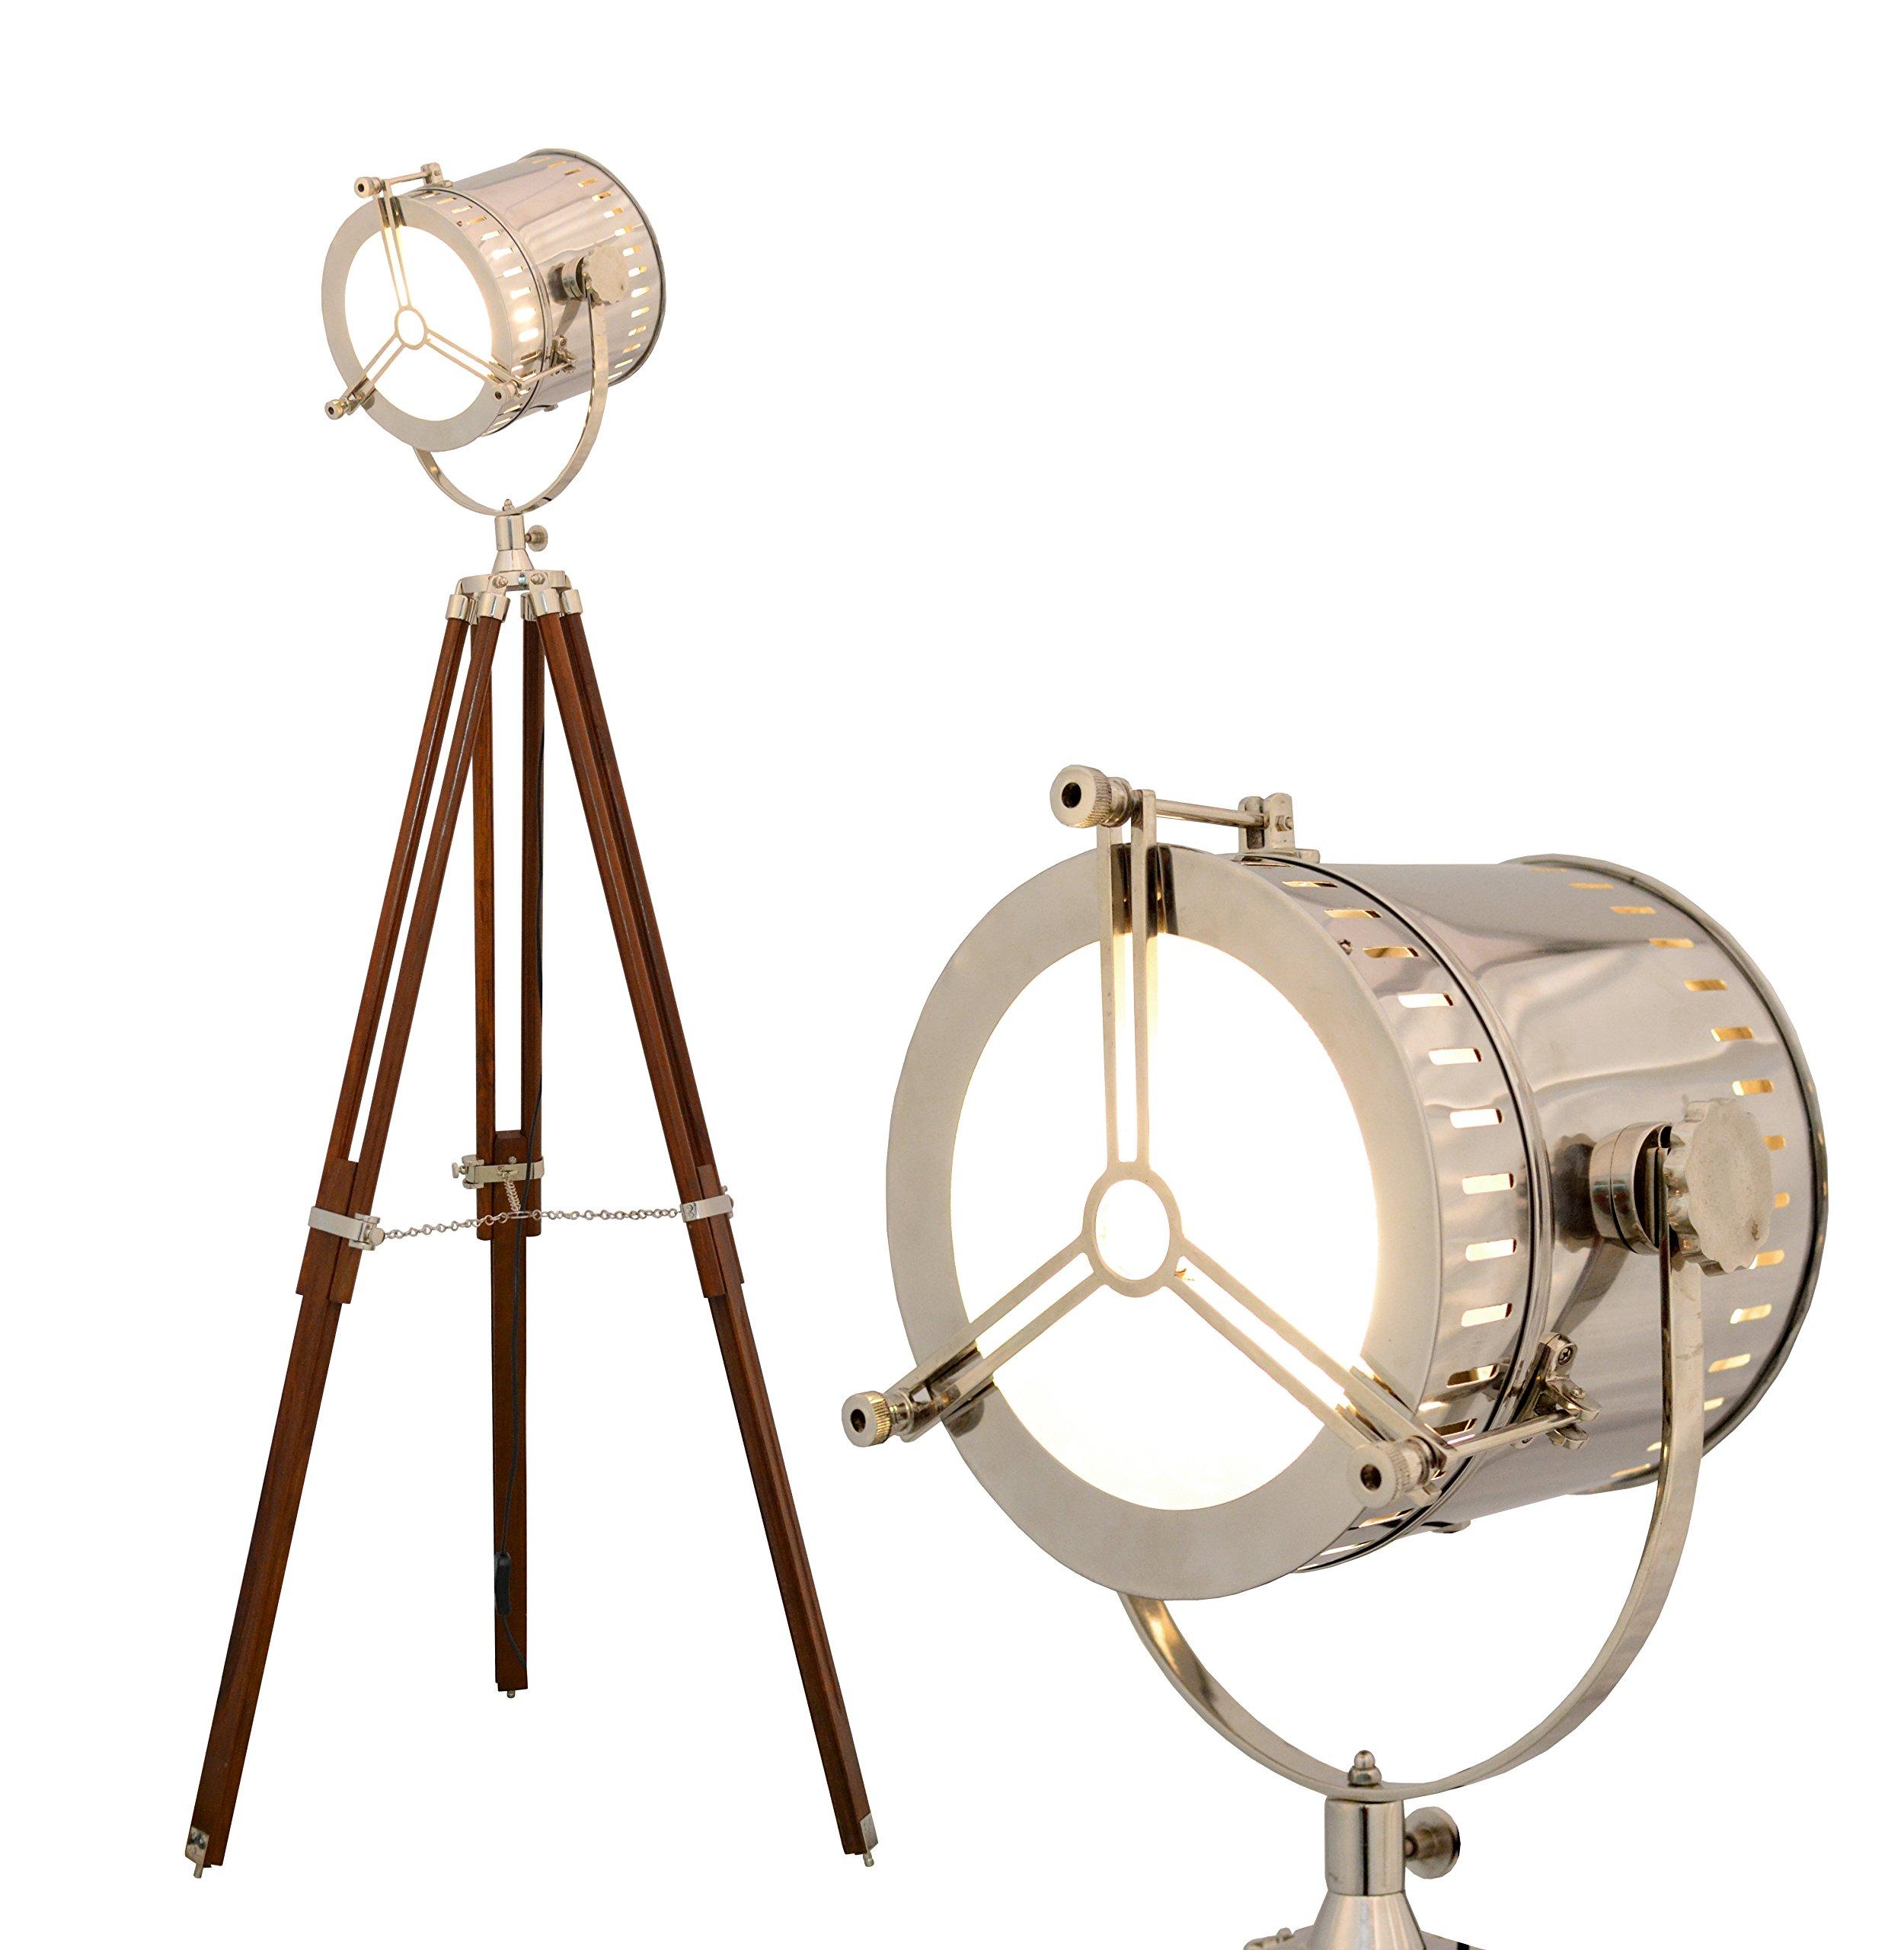 Brass Nautical Hollywood Tripod Floor Lamp - 1940's Hand Made Replica